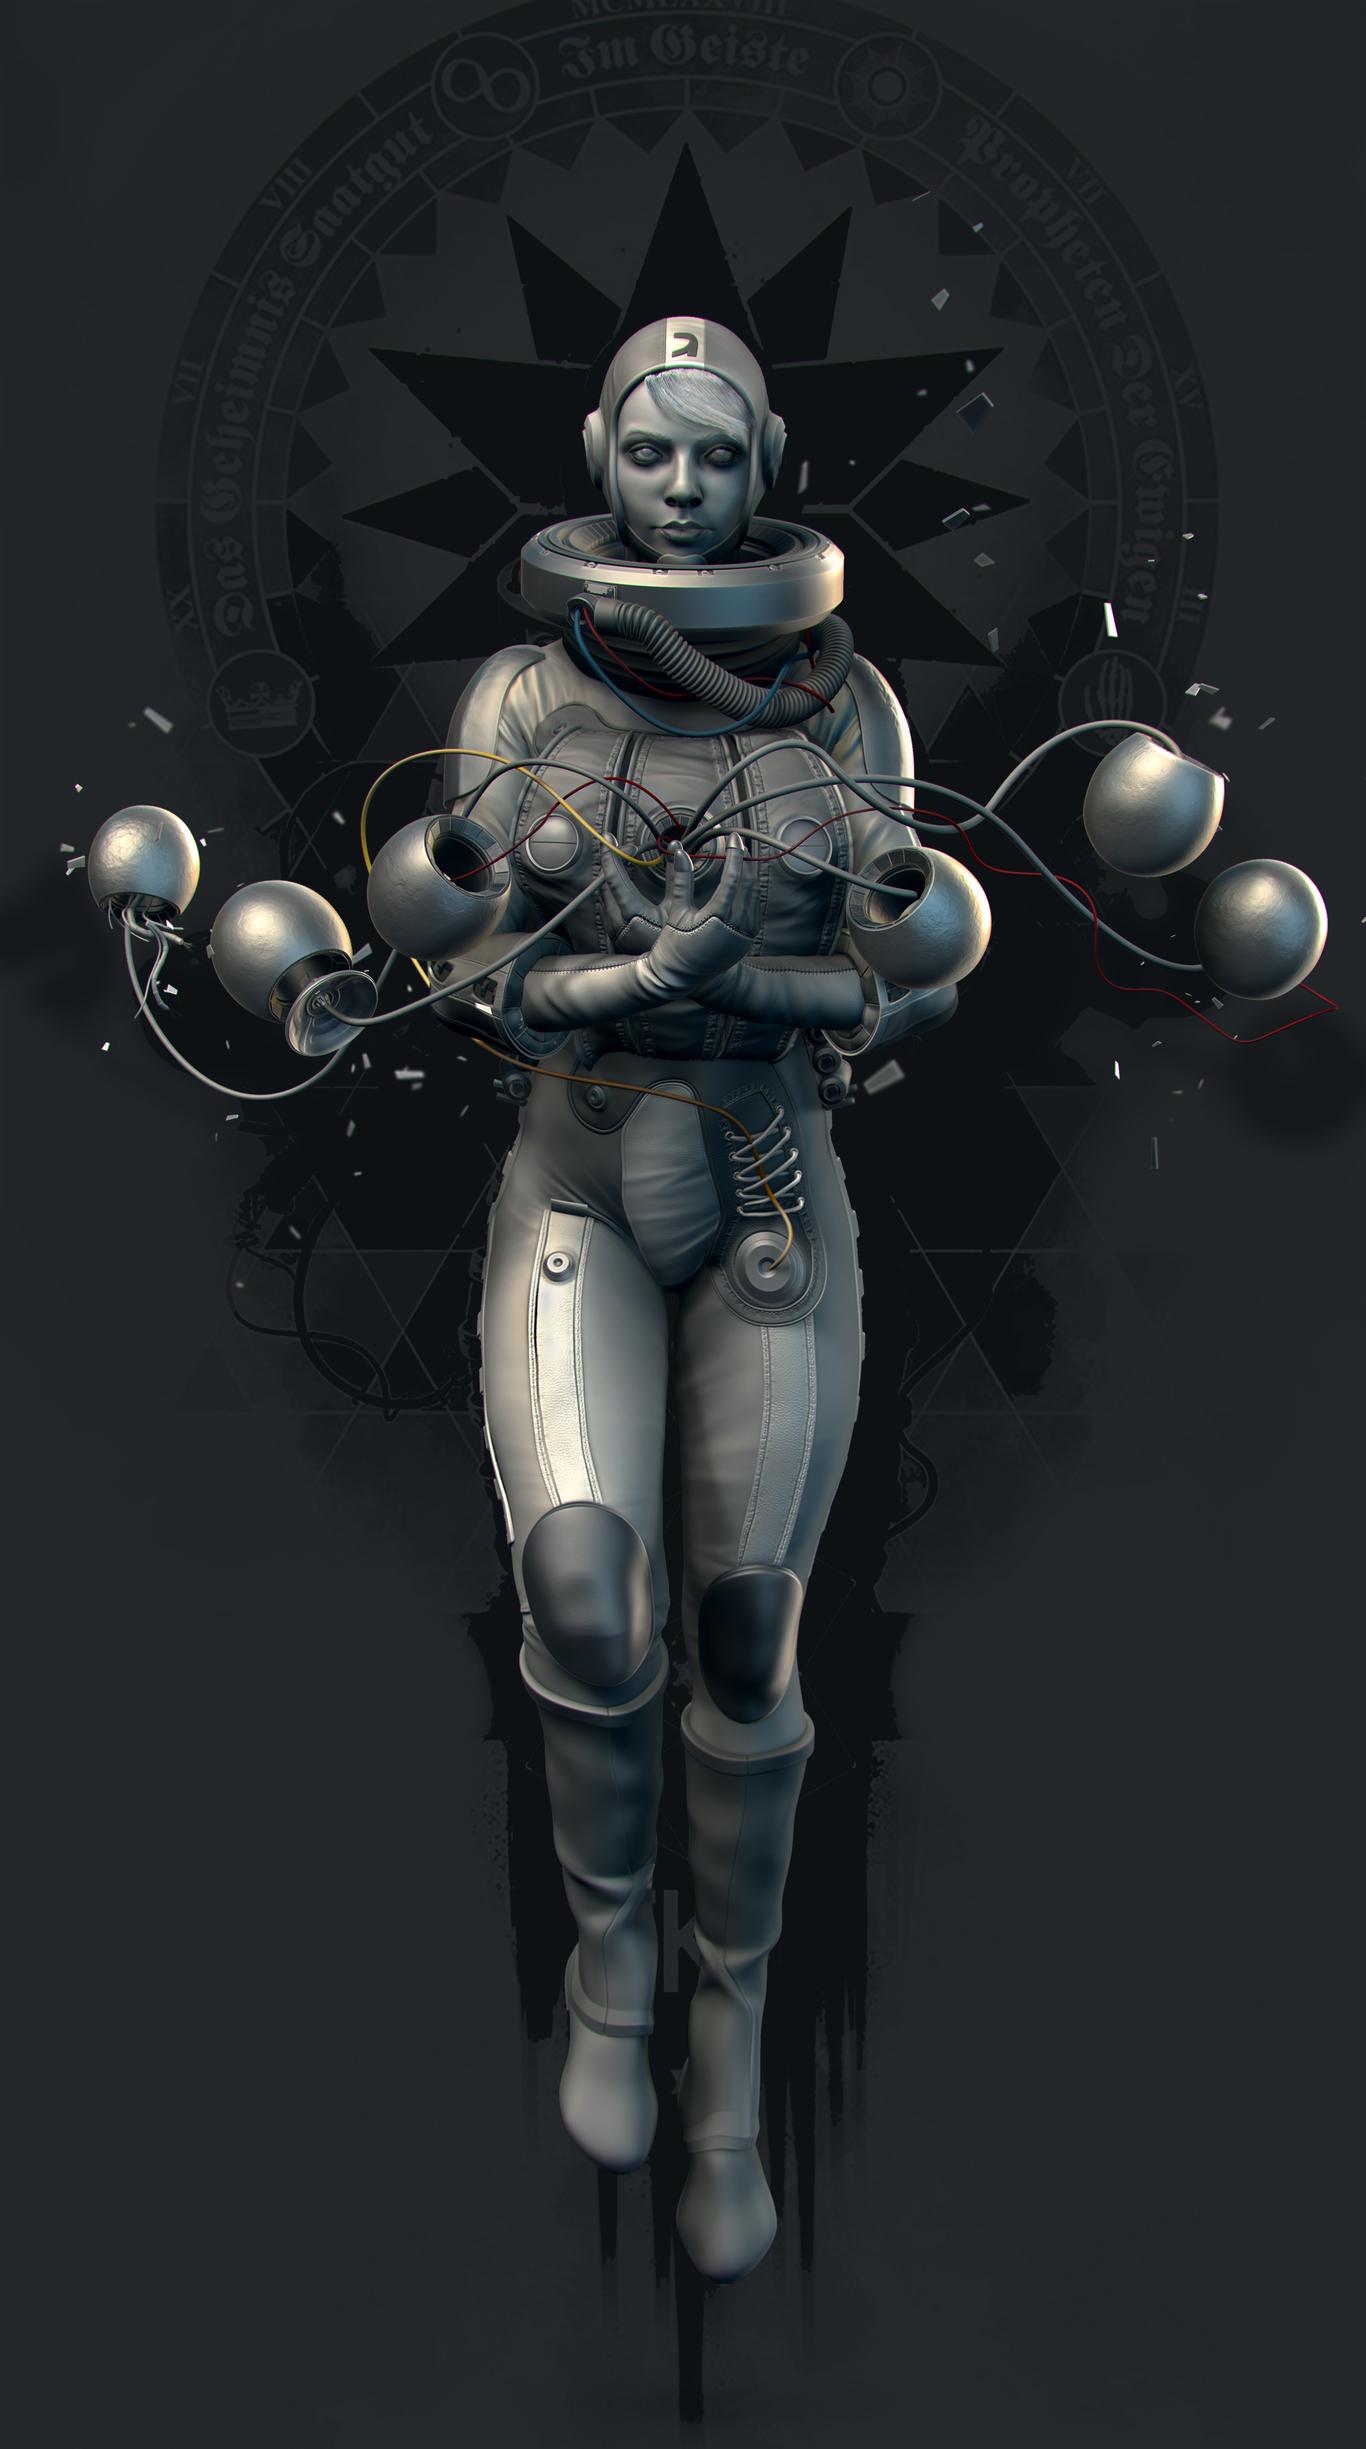 Viniciusfavero cosmonaut 1 b5df0748 d4e9